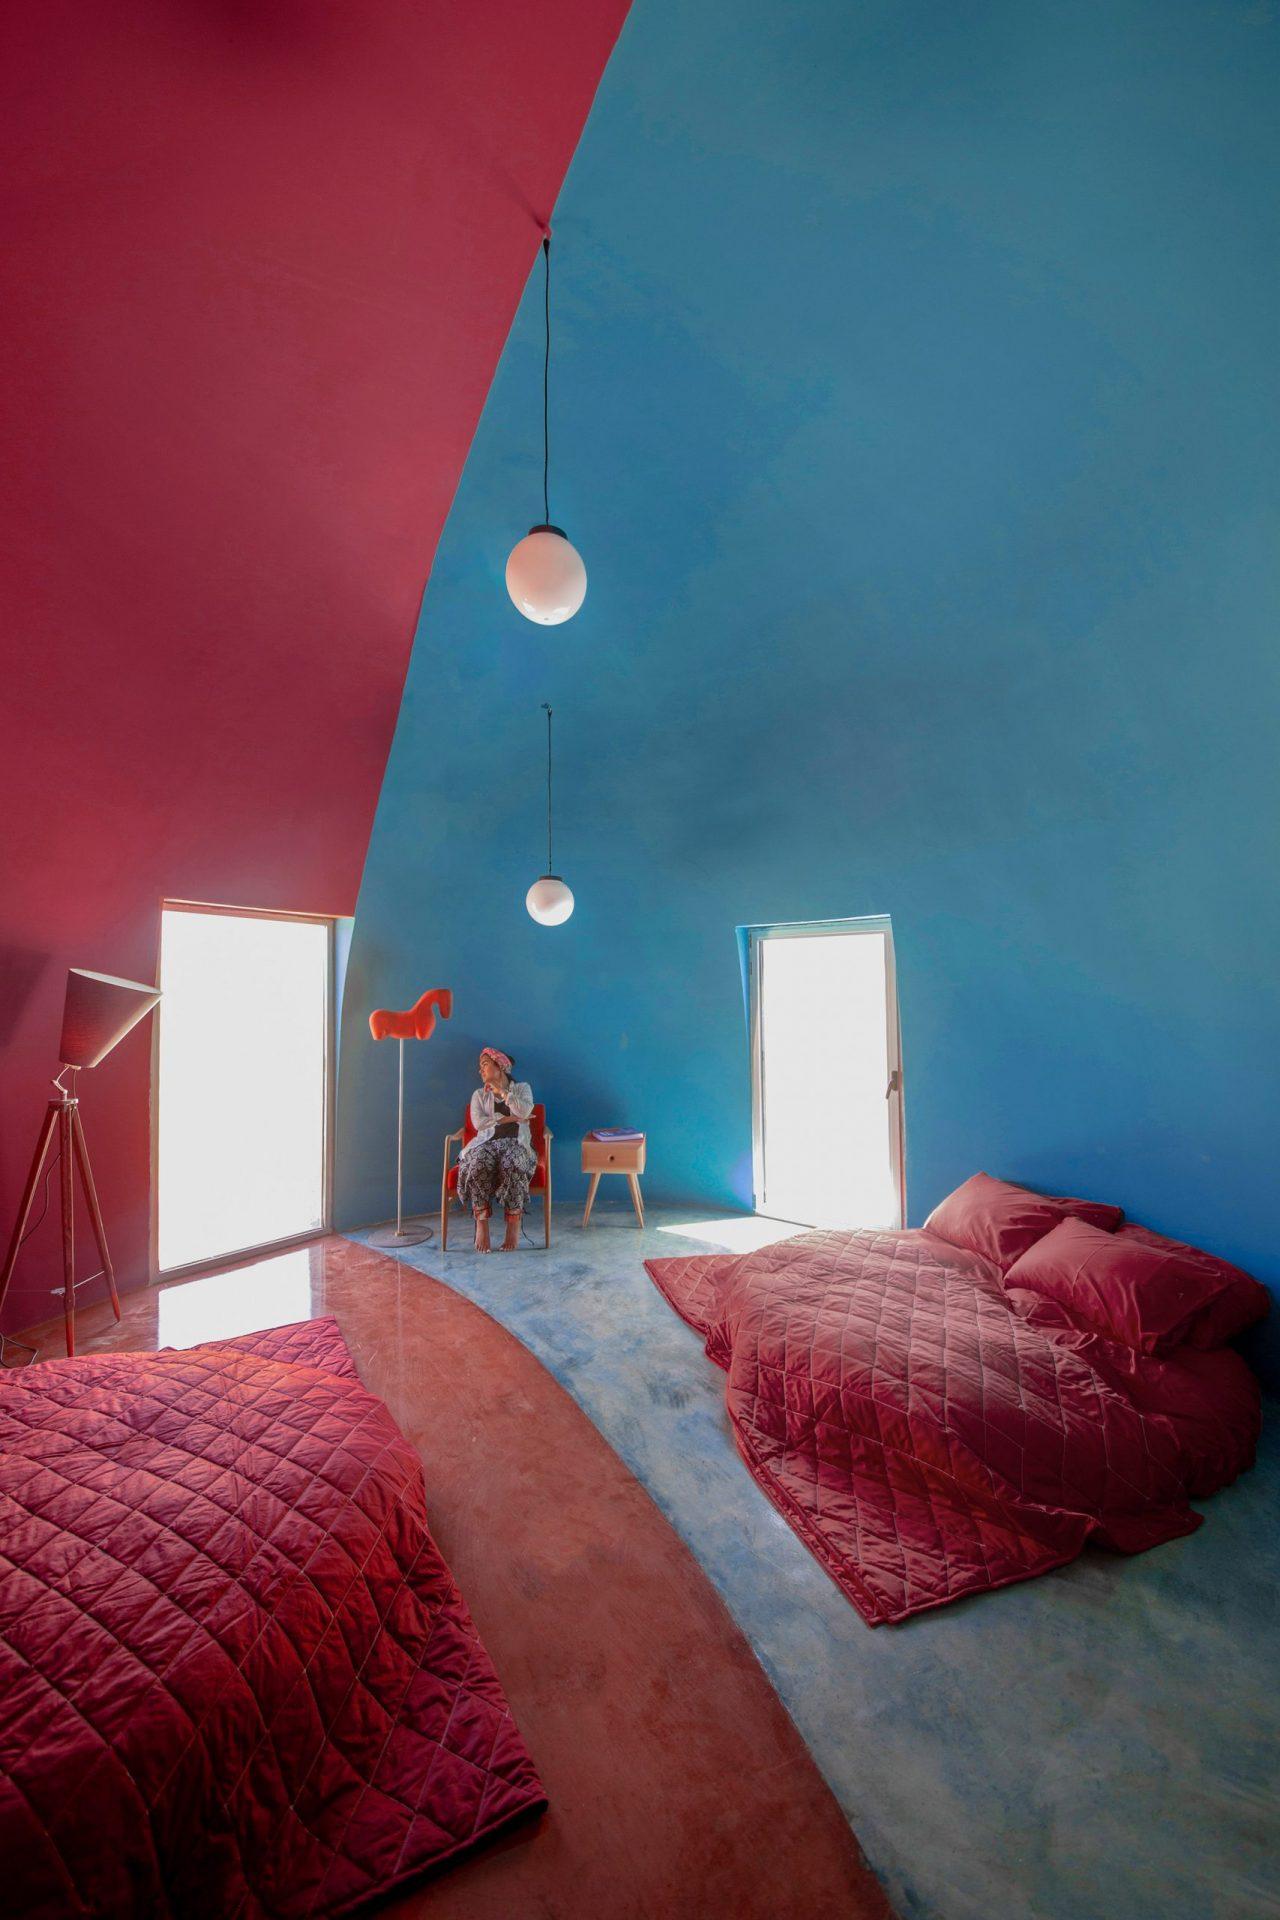 zav_architects_iran_hormuz_island_designalive-13